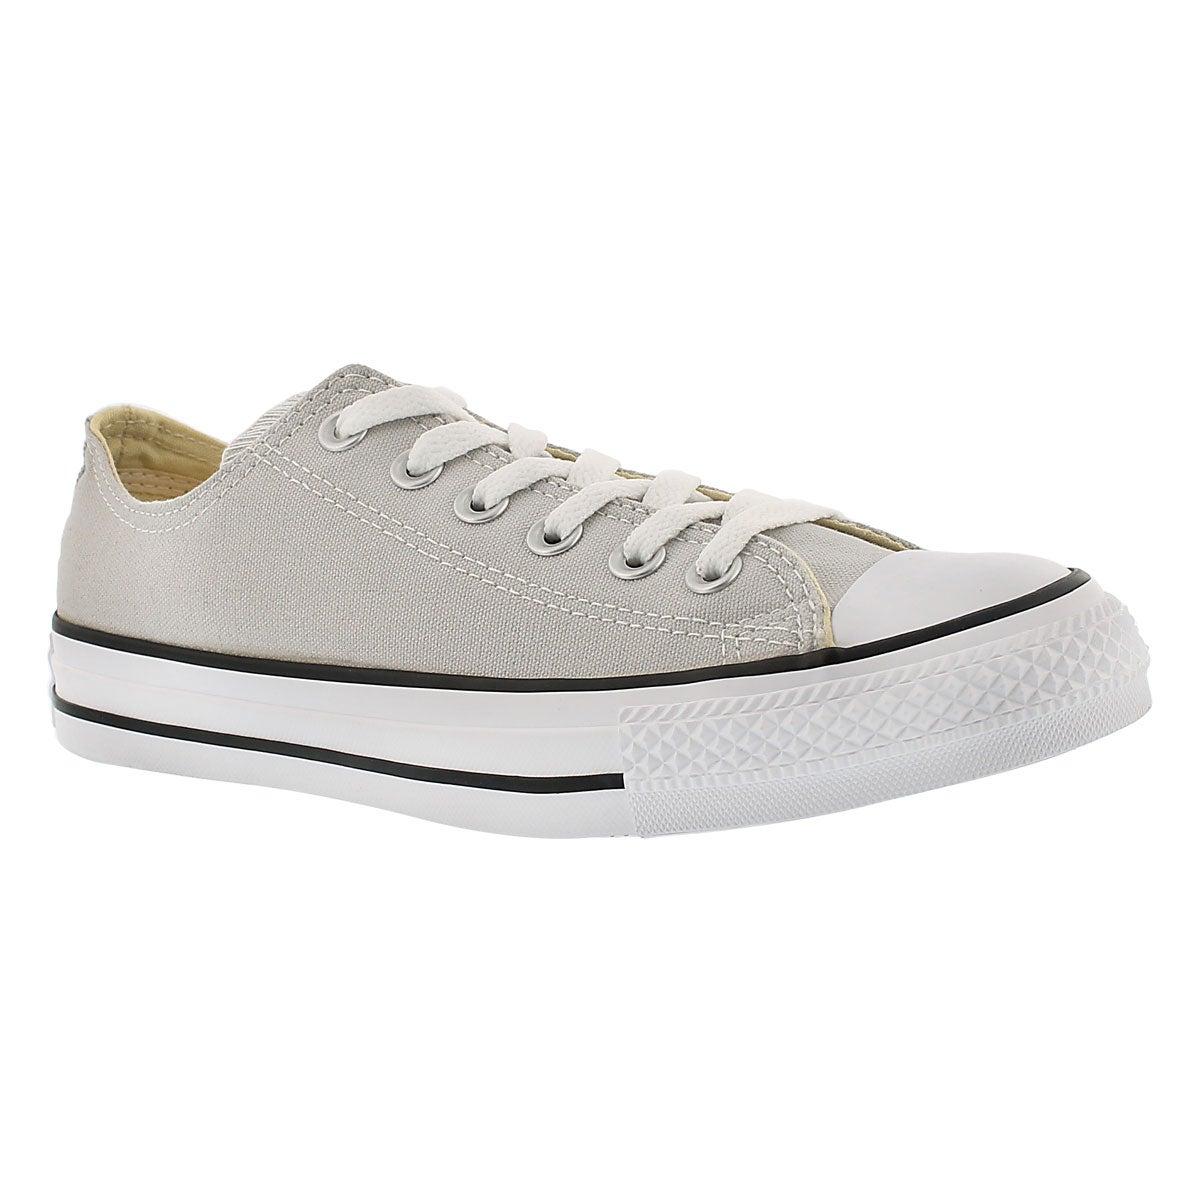 Women's CT ALL STAR SEASONAL mouse sneakers